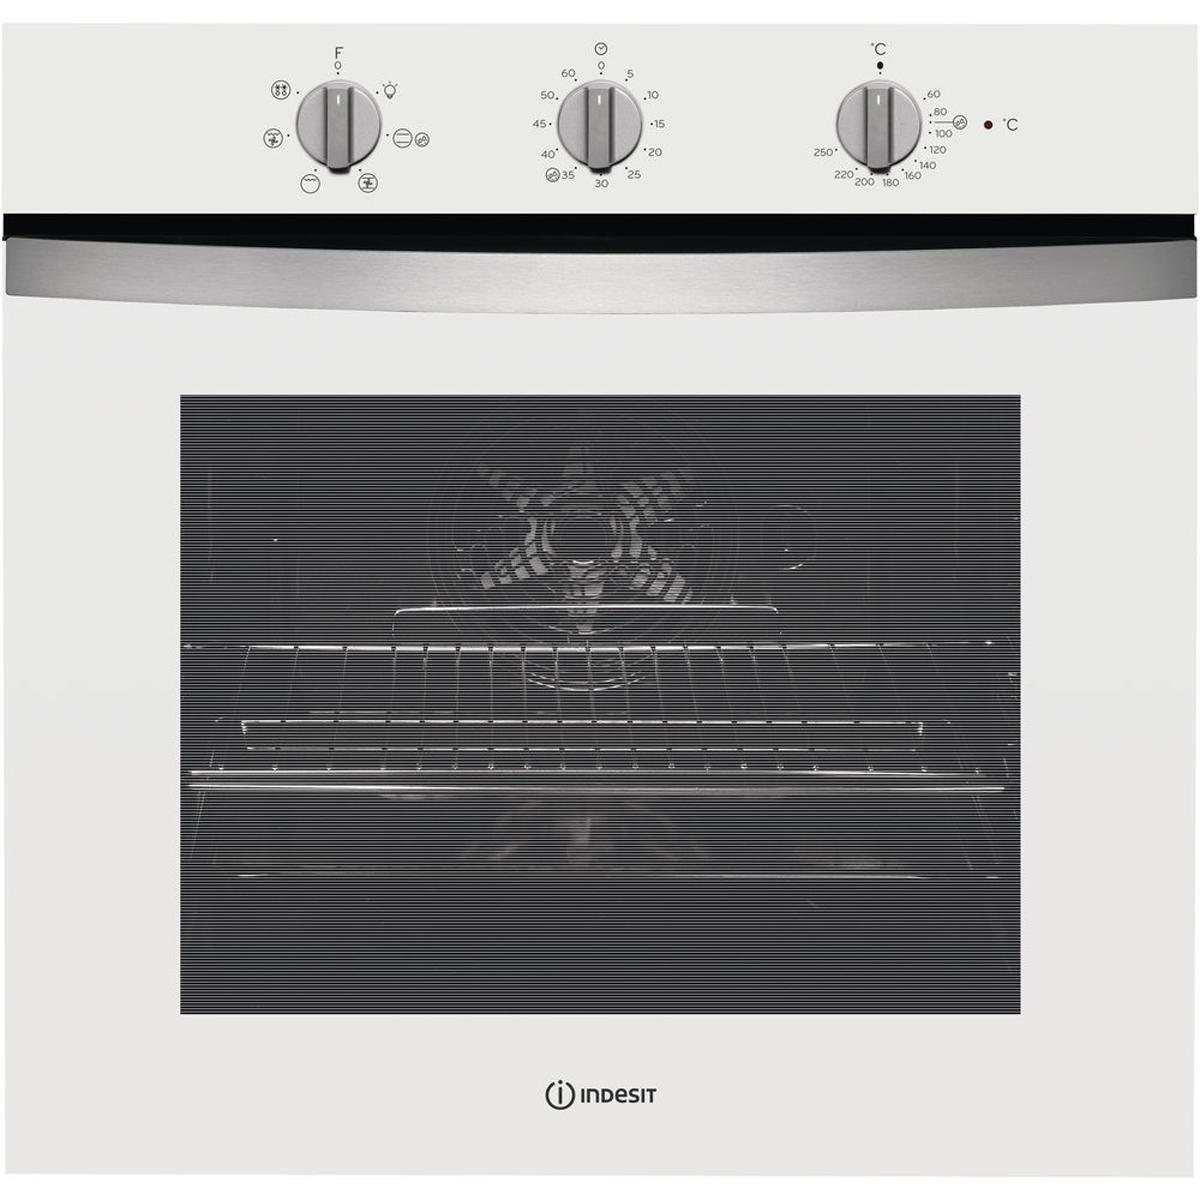 Электрический духовой шкаф встраиваемый Indesit IFW 4534 H WH, White